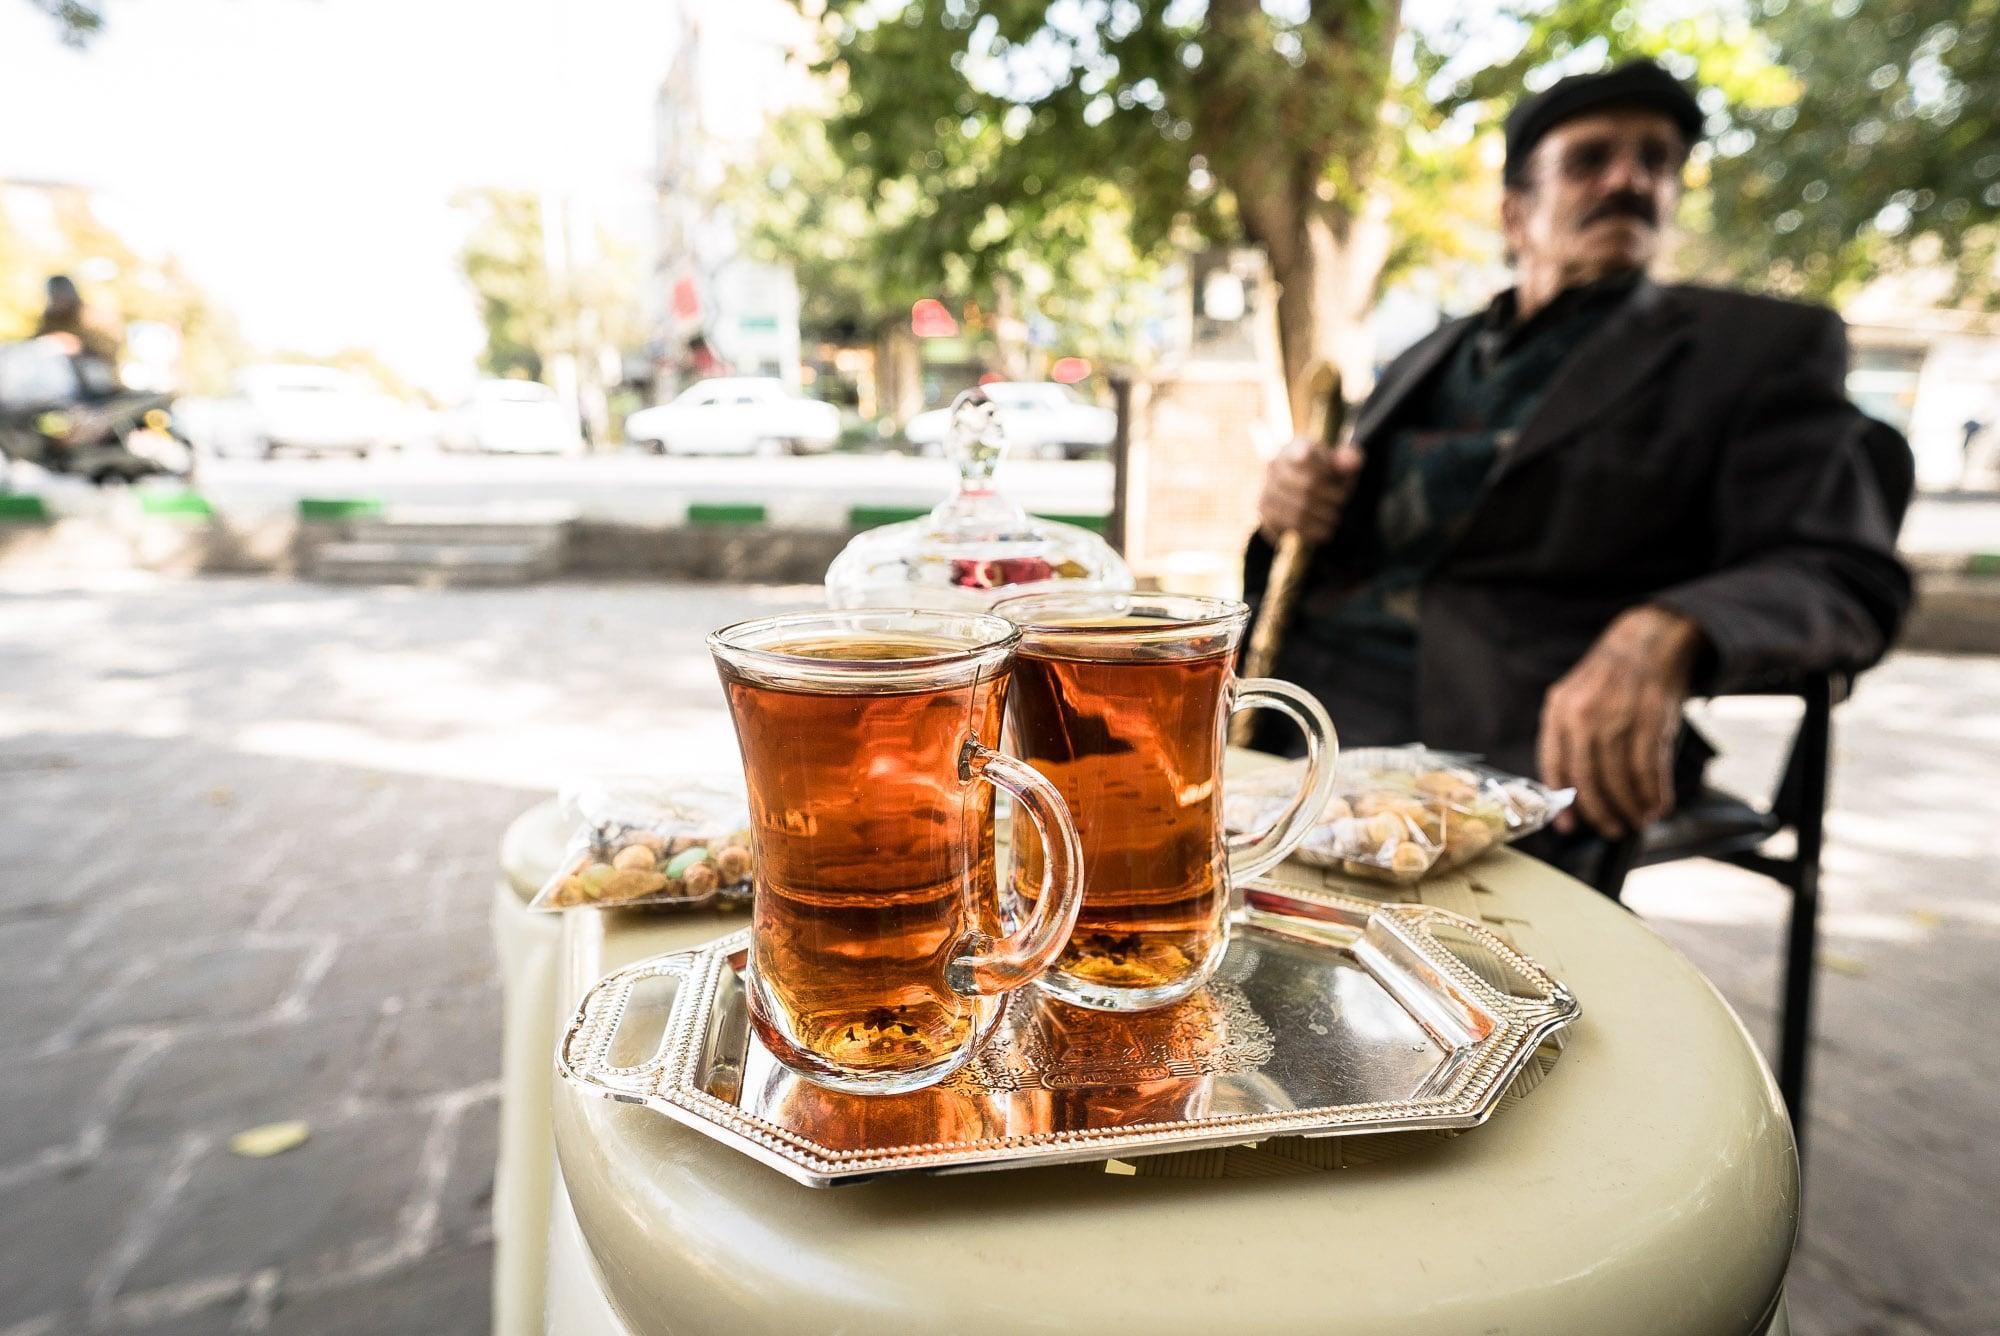 tea at Gonbad Sabz